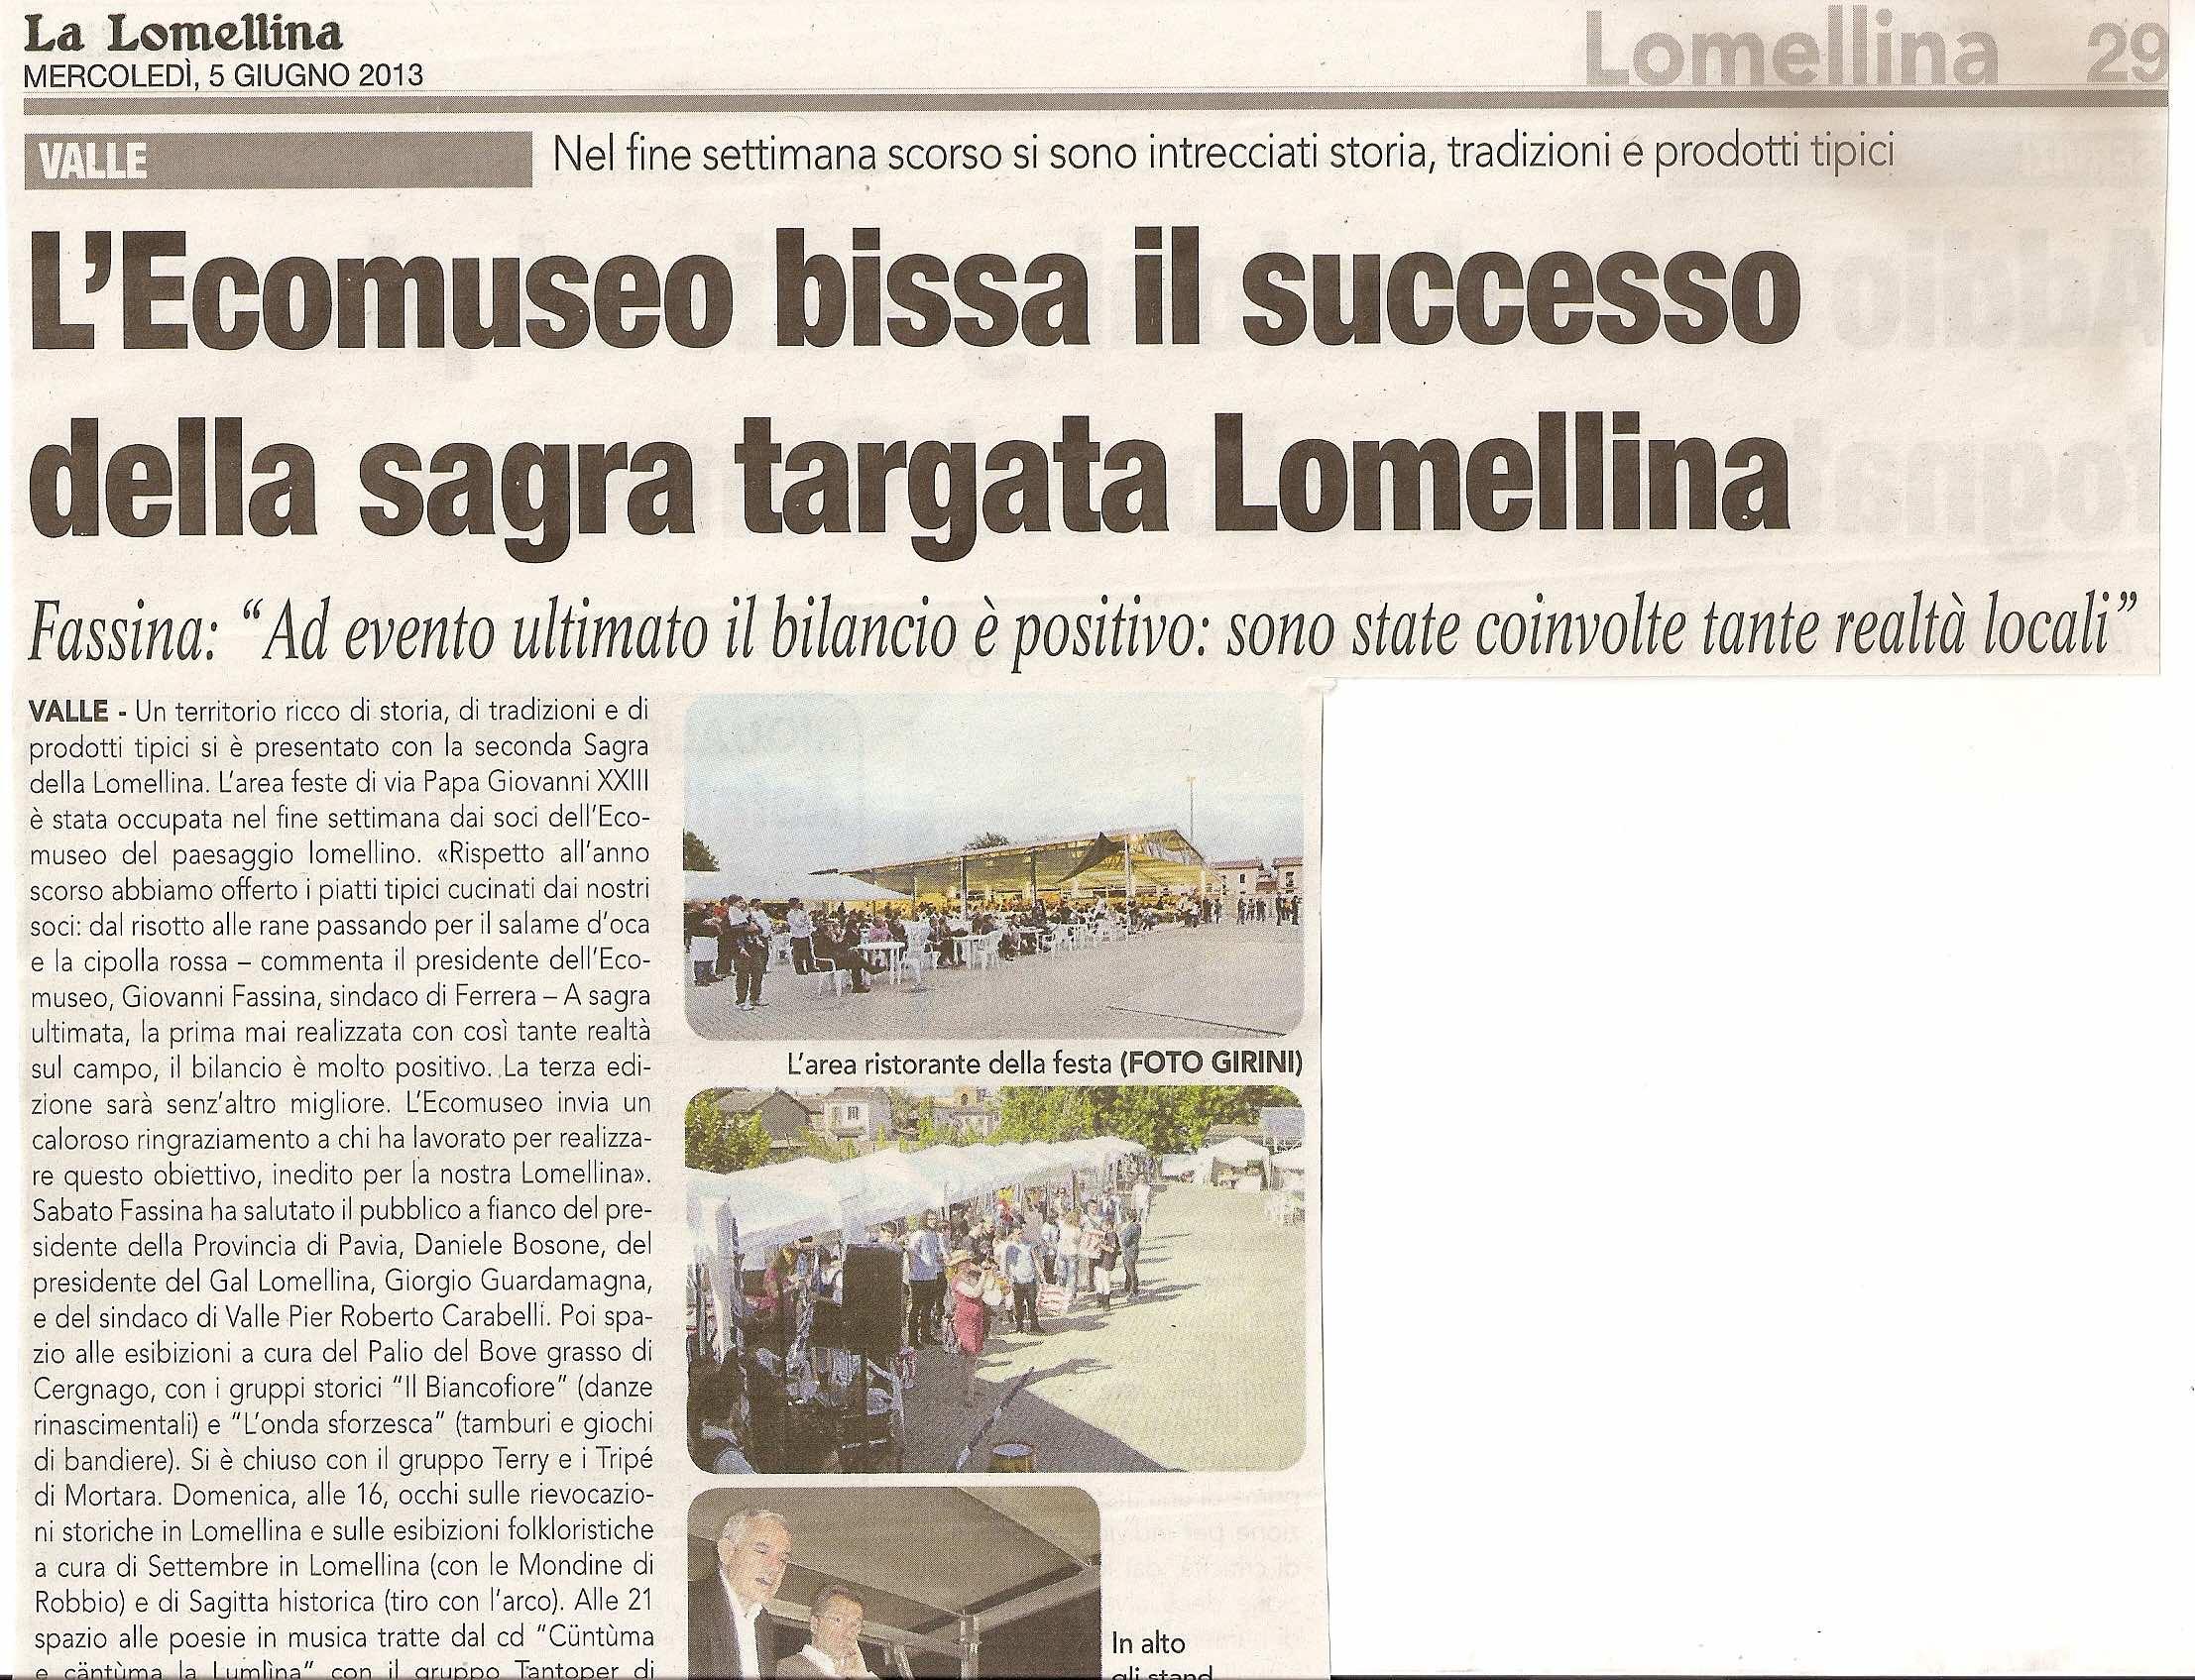 2013-06-05 La Lomellina